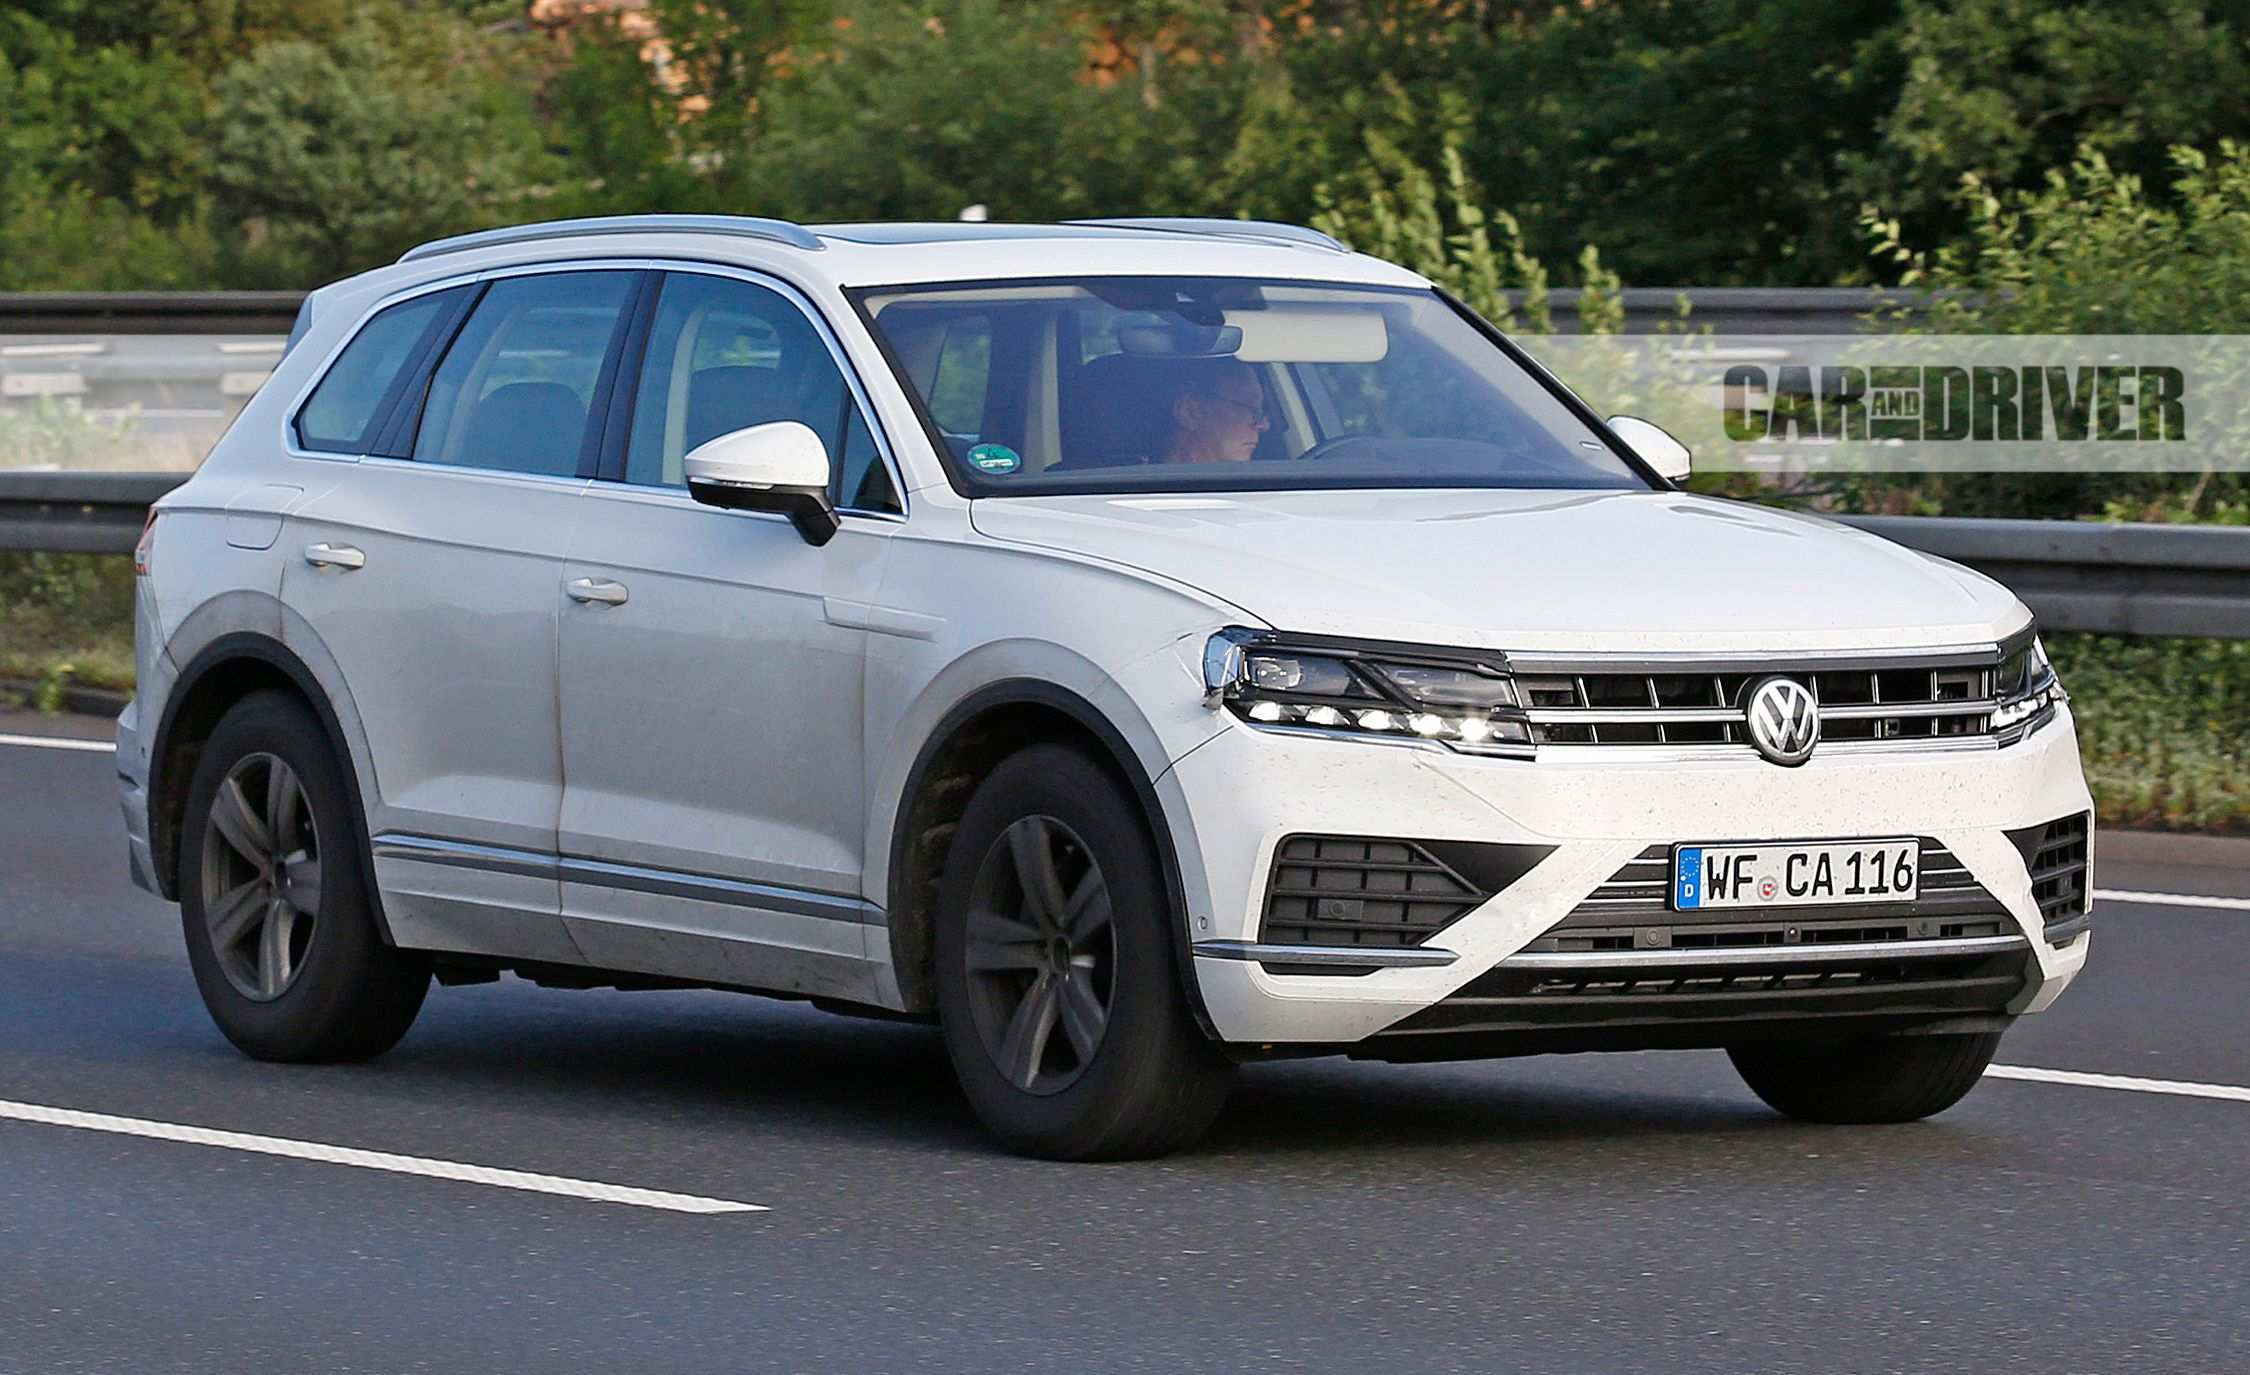 82 New Volkswagen 2020 Touareg Exterior Exterior for Volkswagen 2020 Touareg Exterior